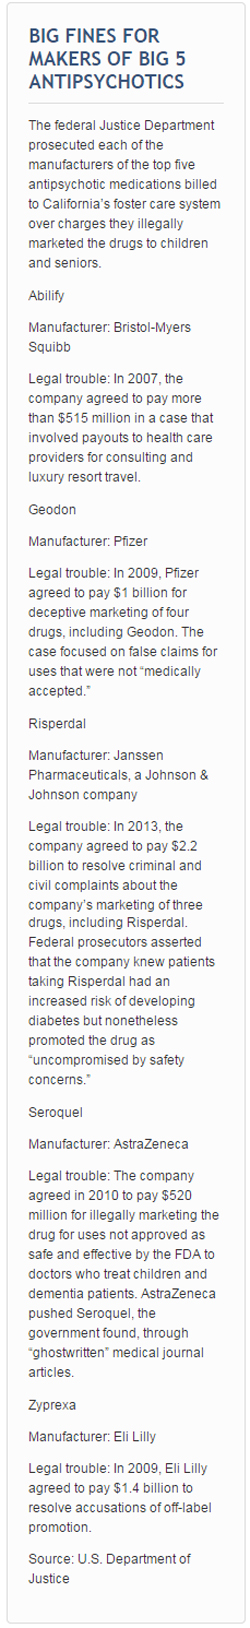 drug-company-fines